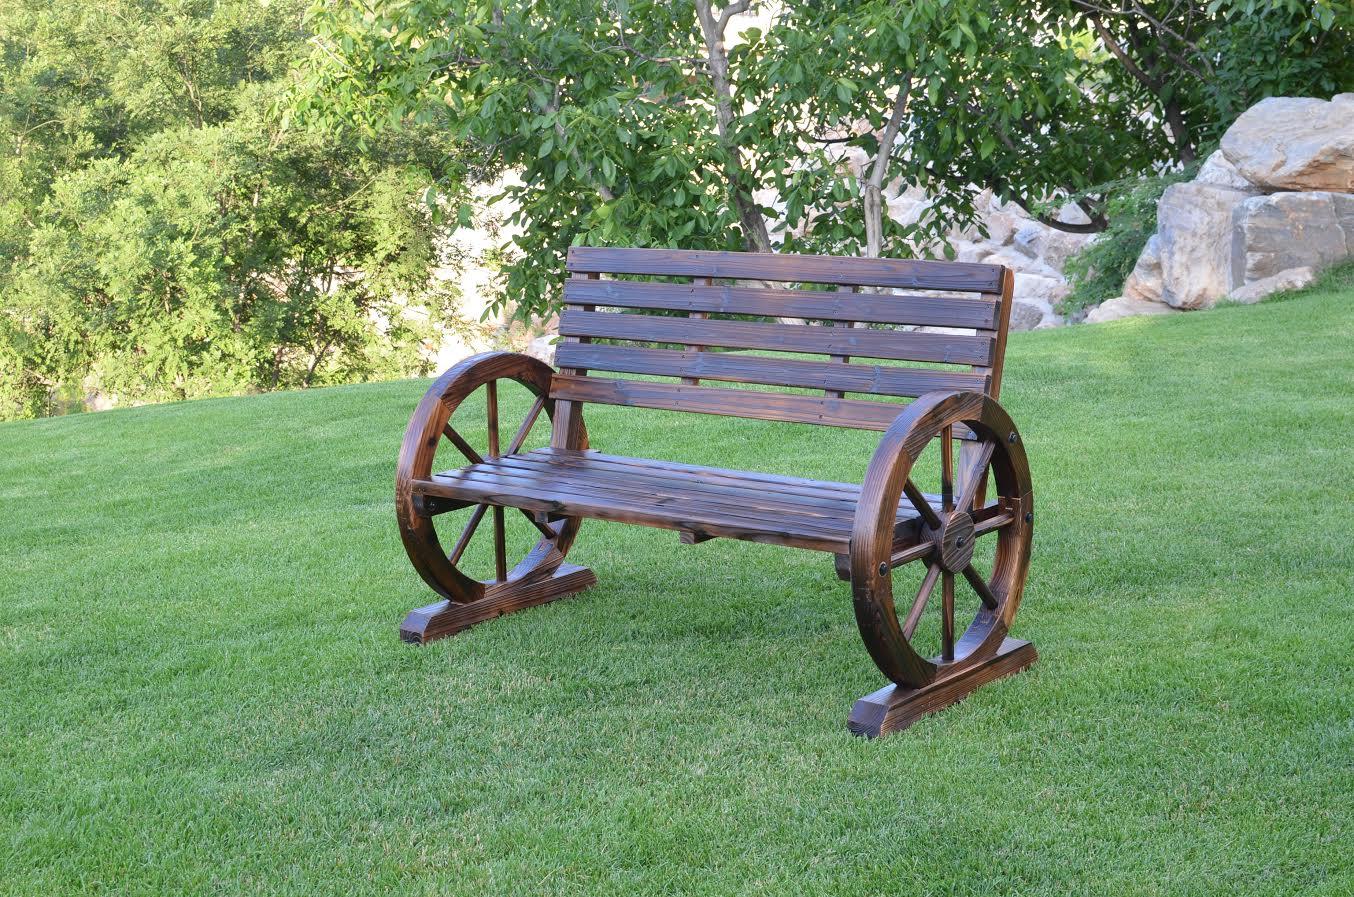 New Large Patio Garden Wooden Wagon Wheel Bench Wgb62